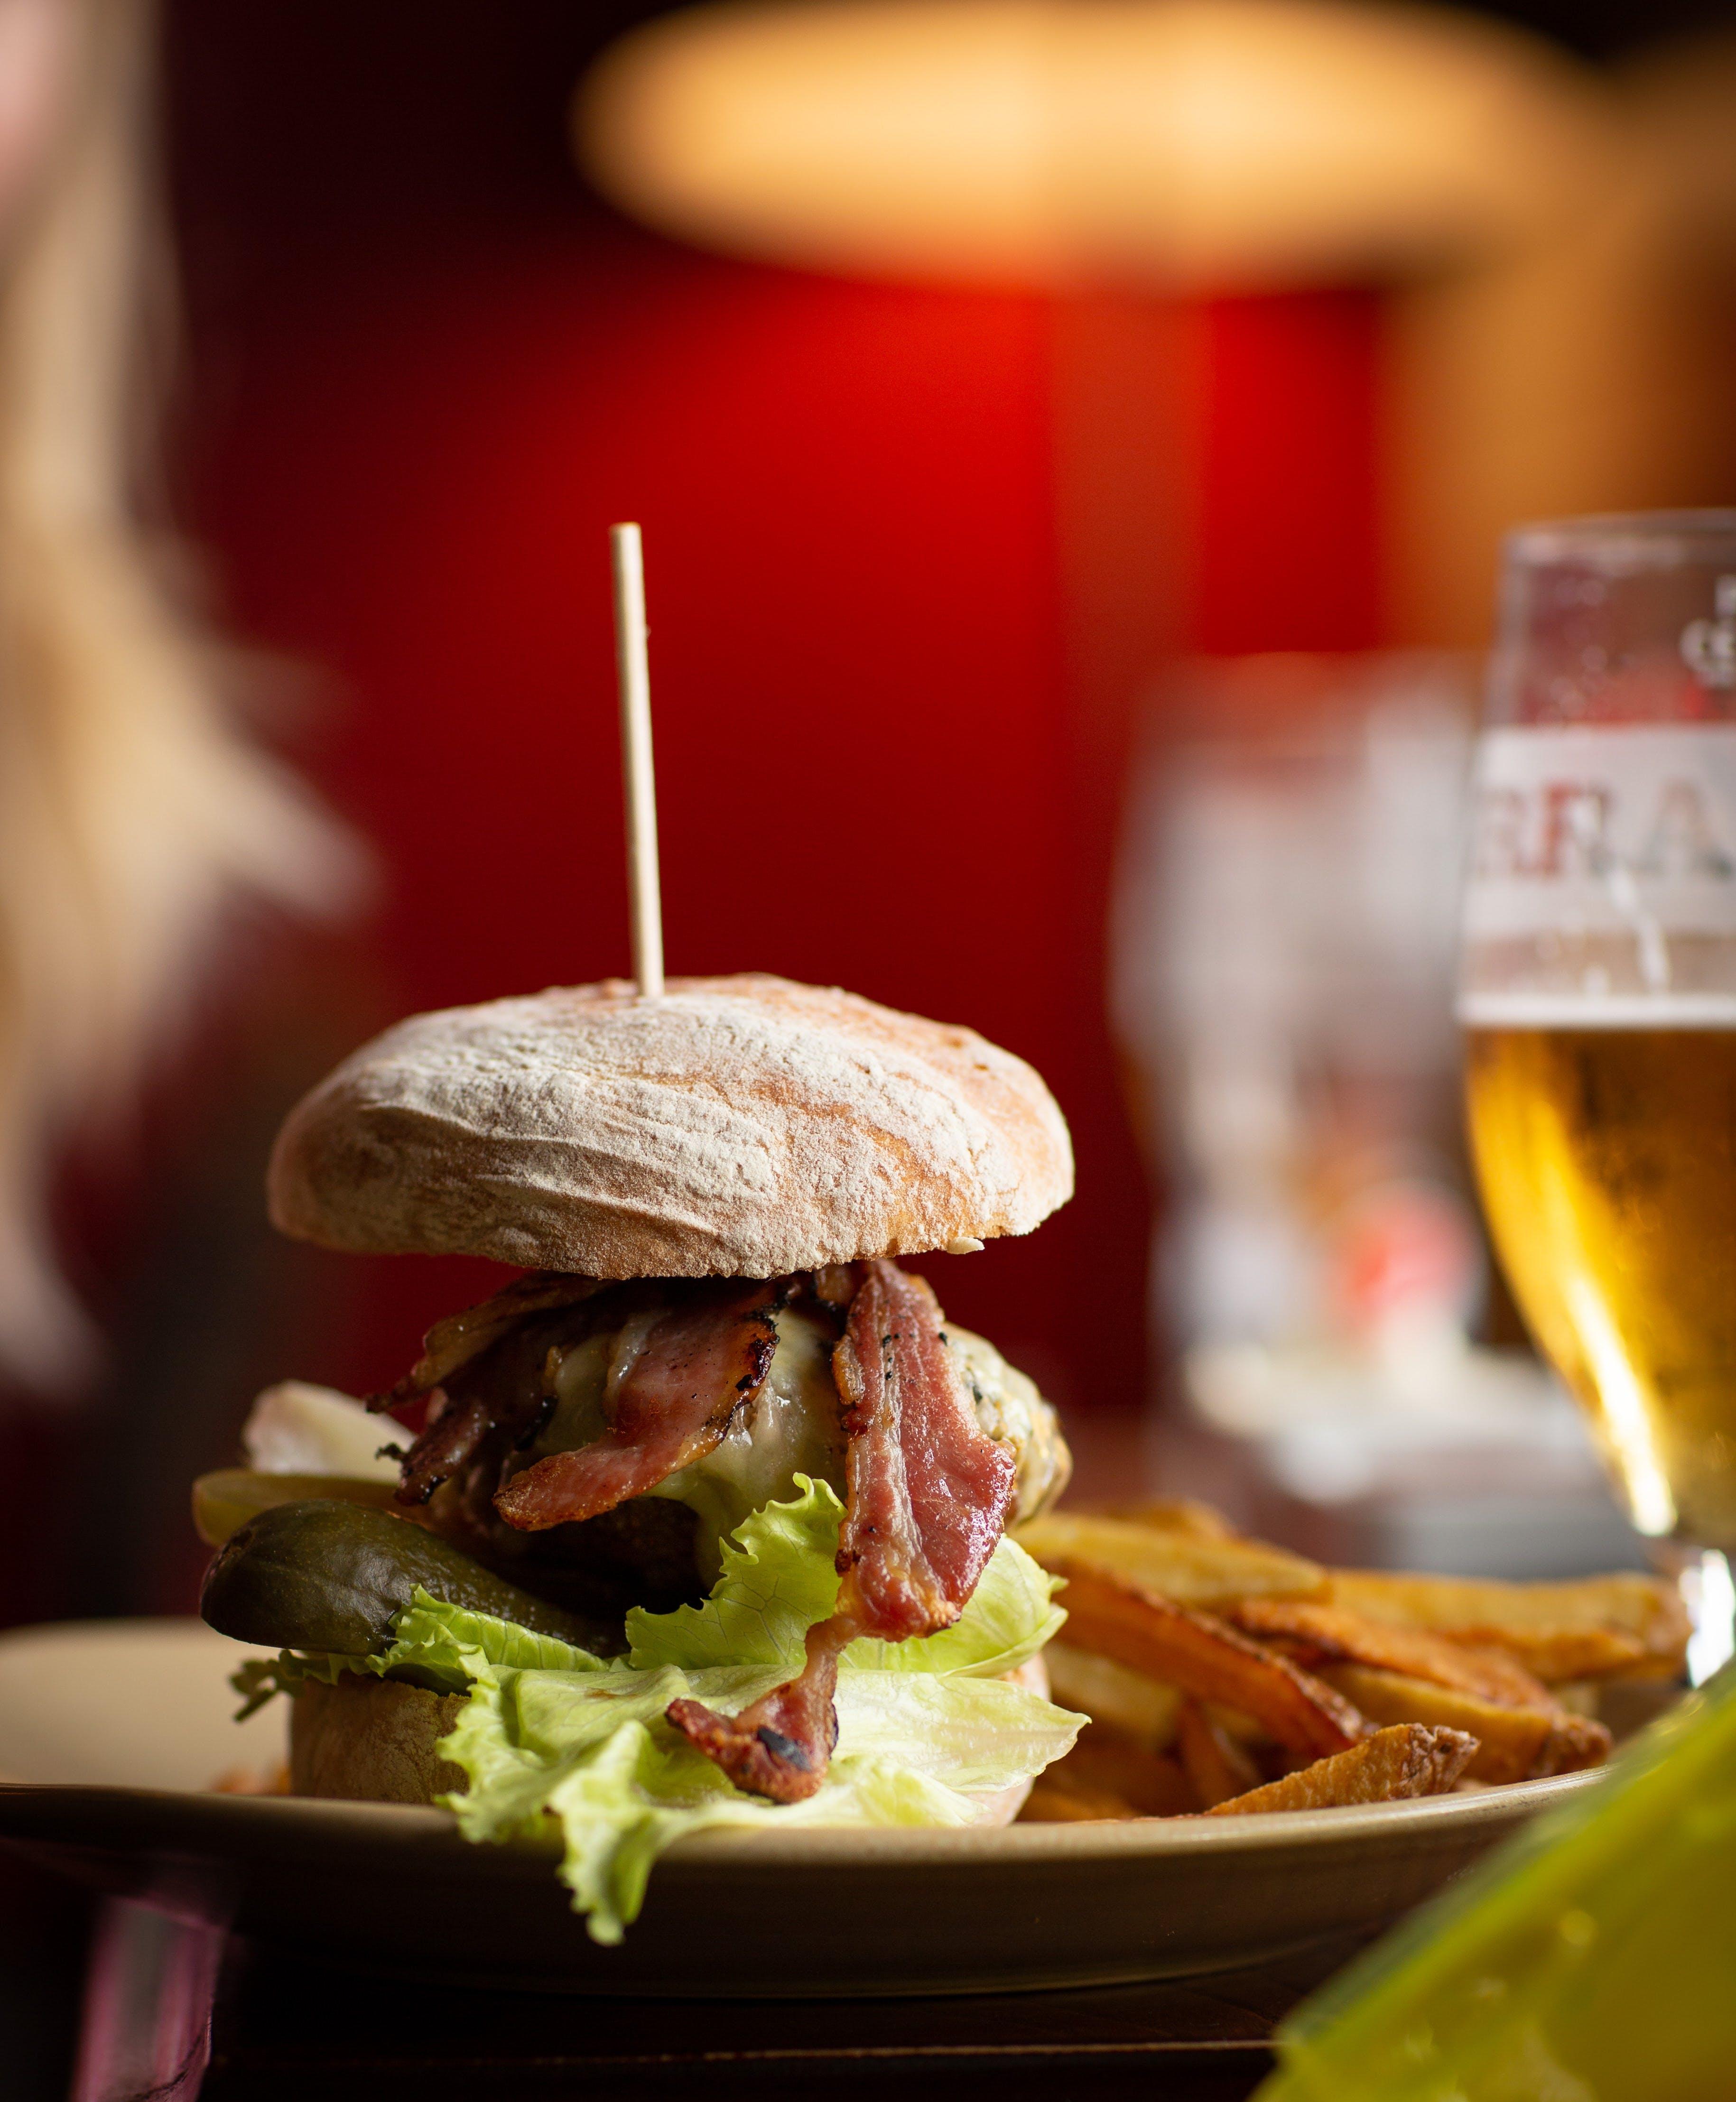 appetizing, burger, cheeseburger